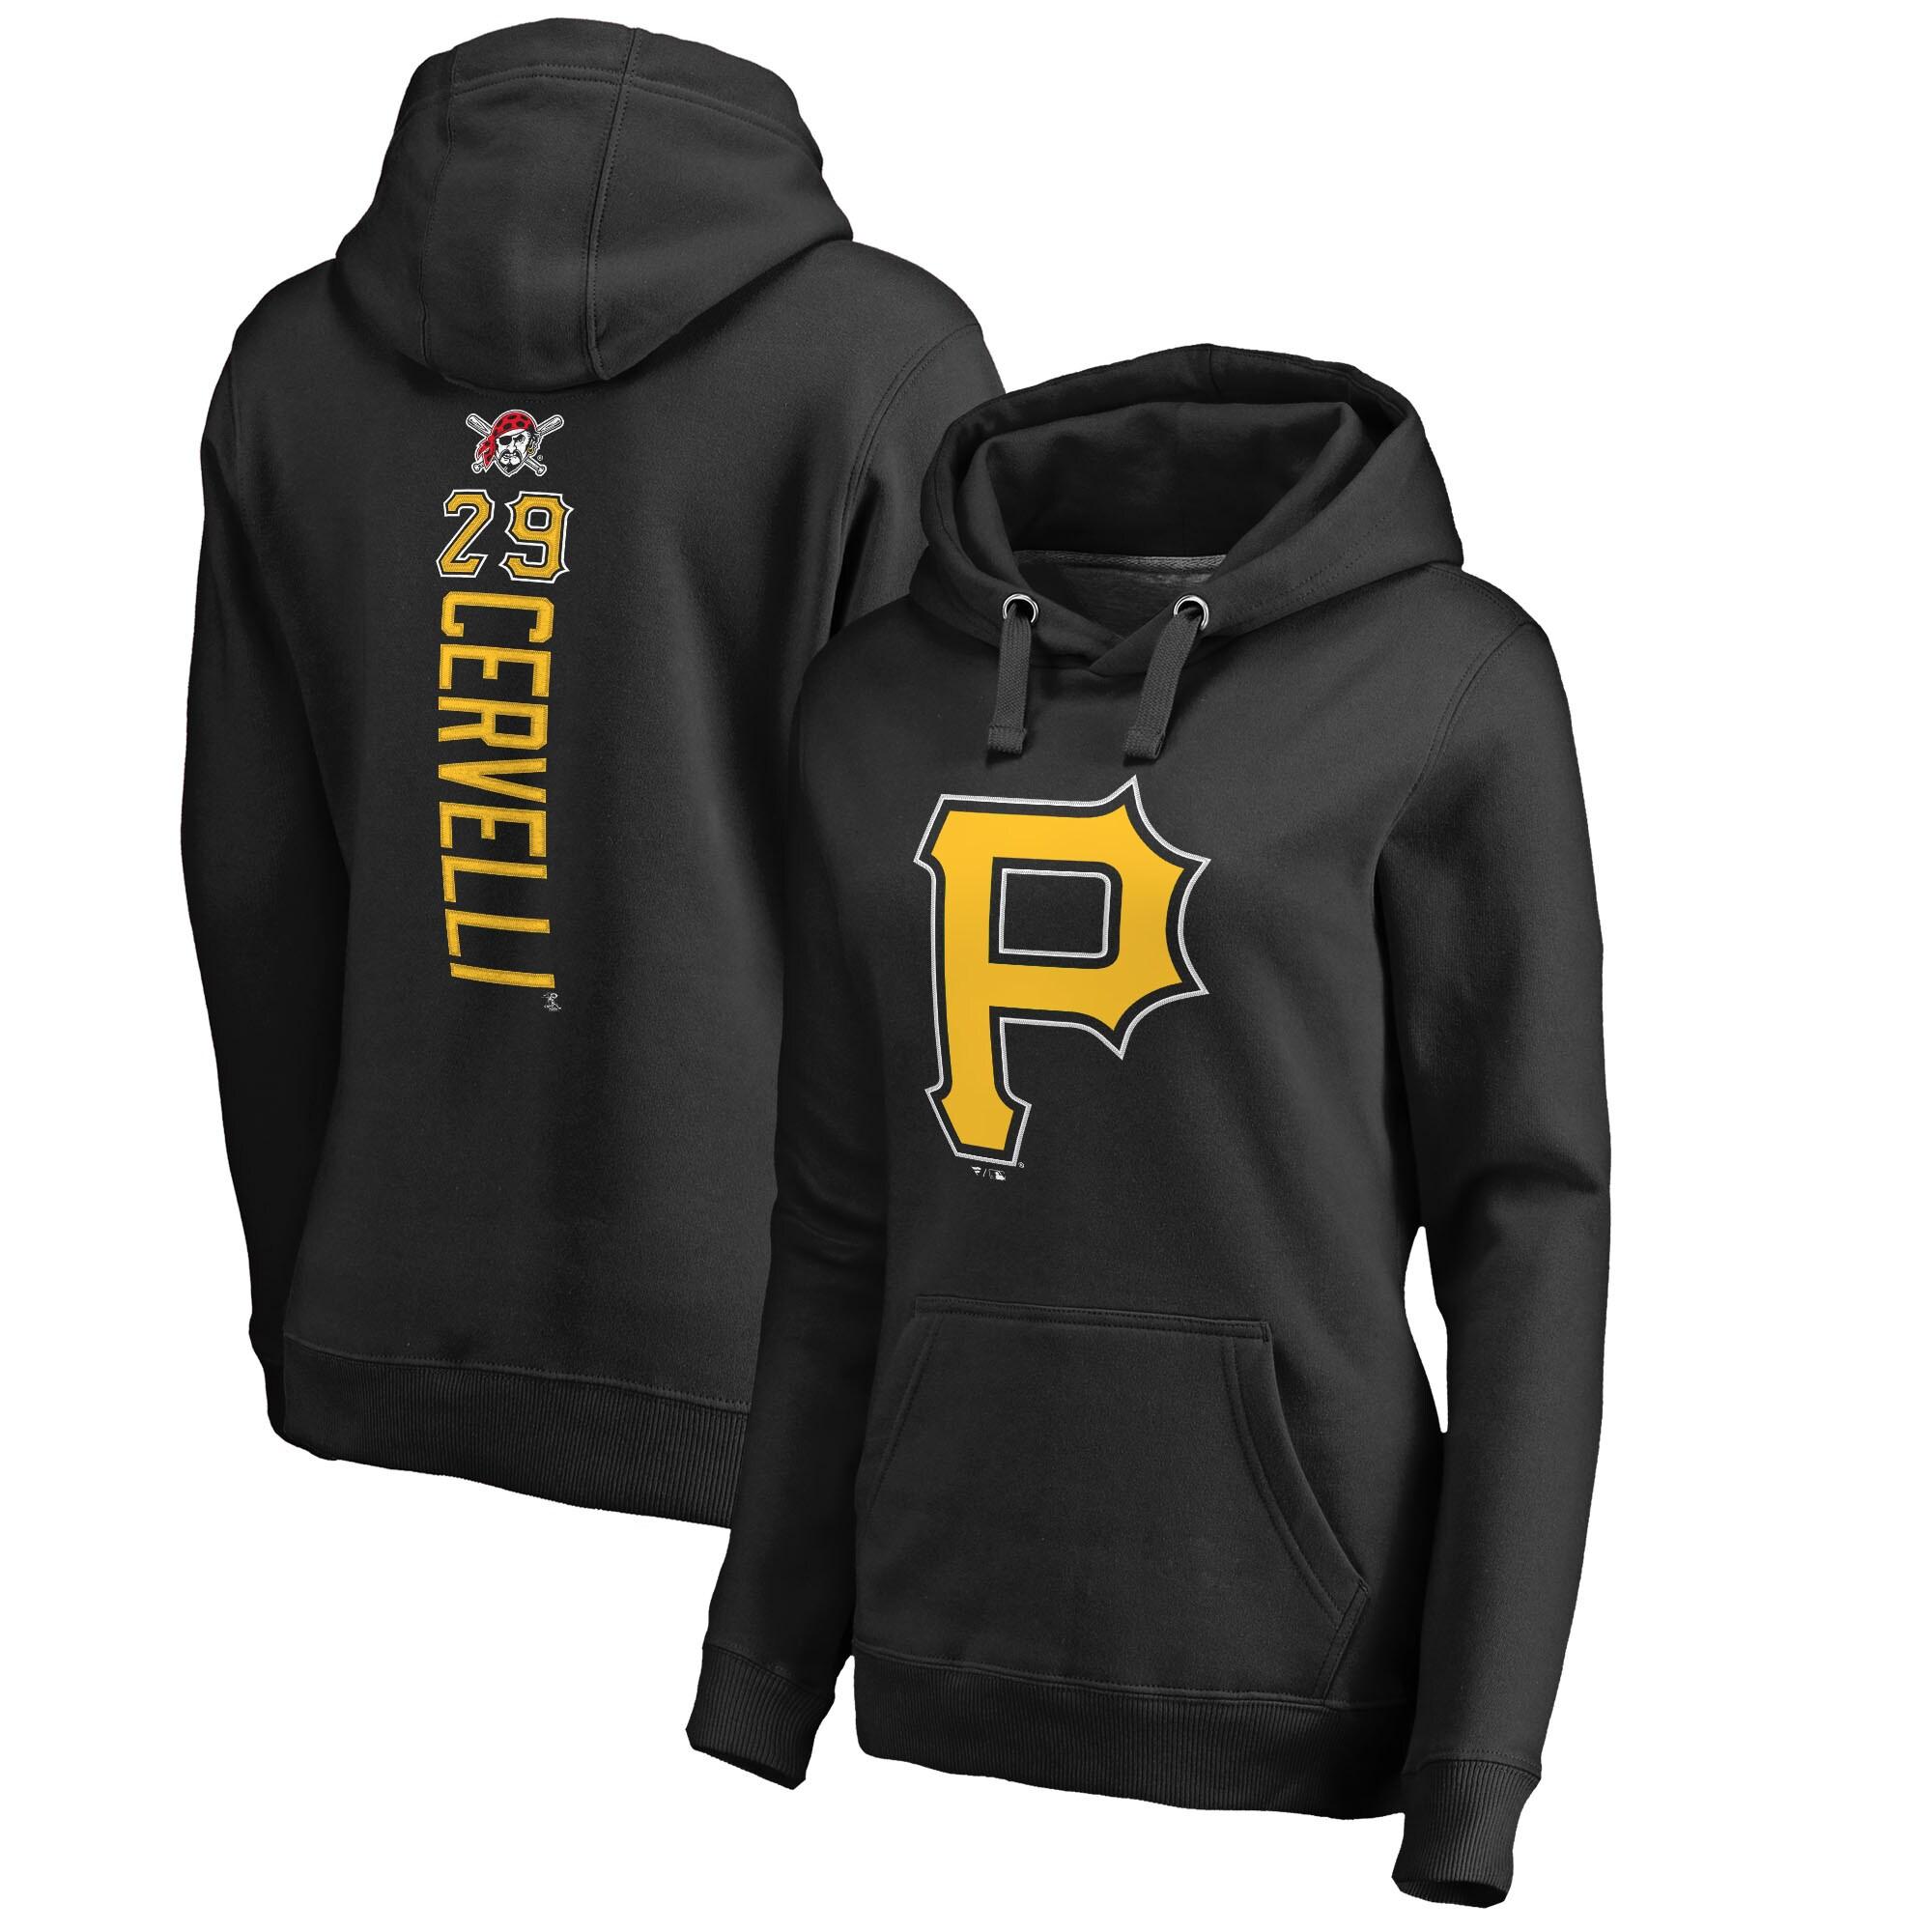 Francisco Cervelli Pittsburgh Pirates Fanatics Branded Women's Backer Pullover Hoodie - Black